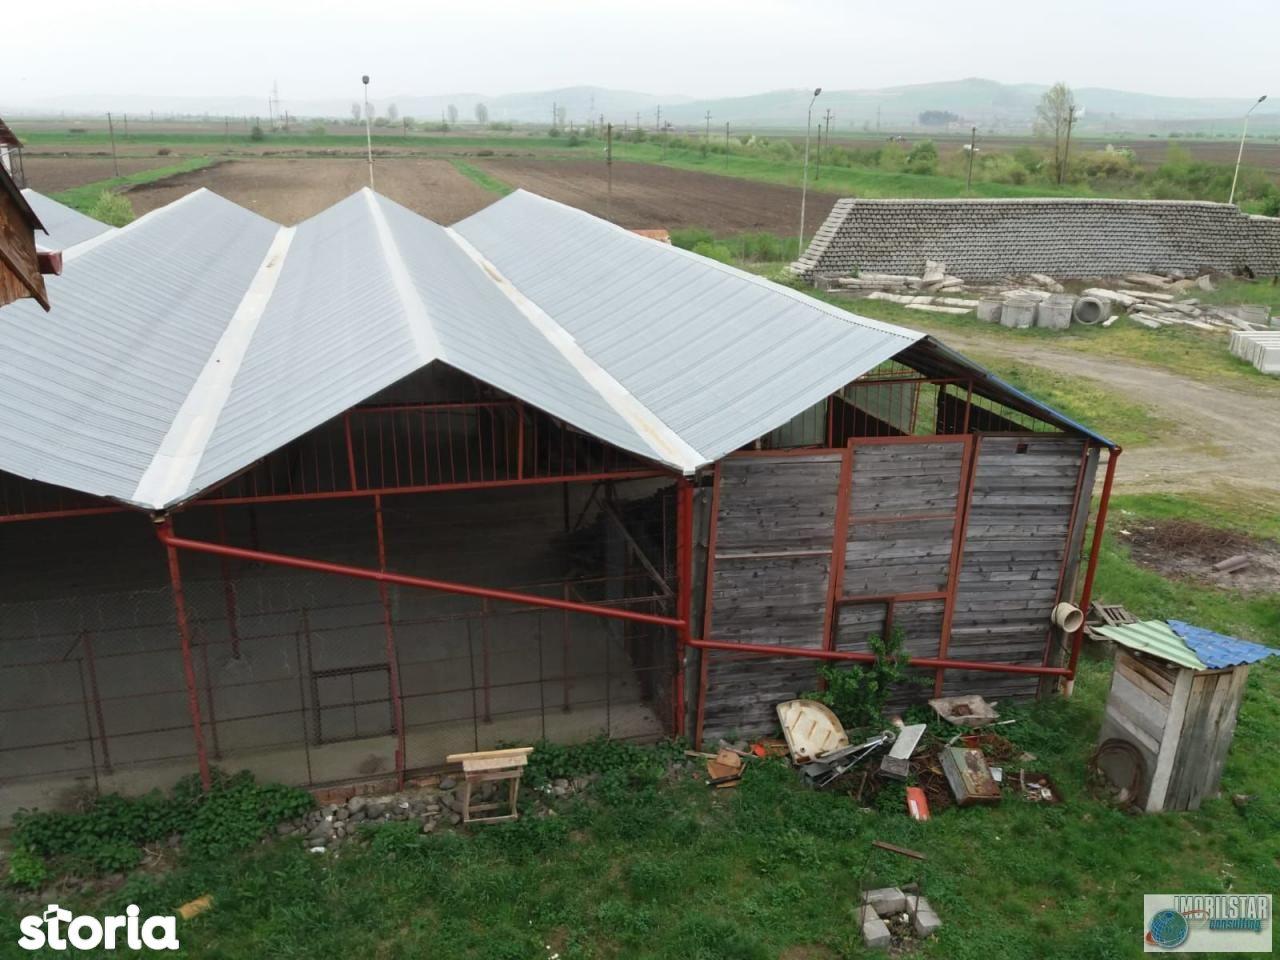 Spatiu Comercial de inchiriat, Mureș (judet), Târgu Mureş - Foto 2